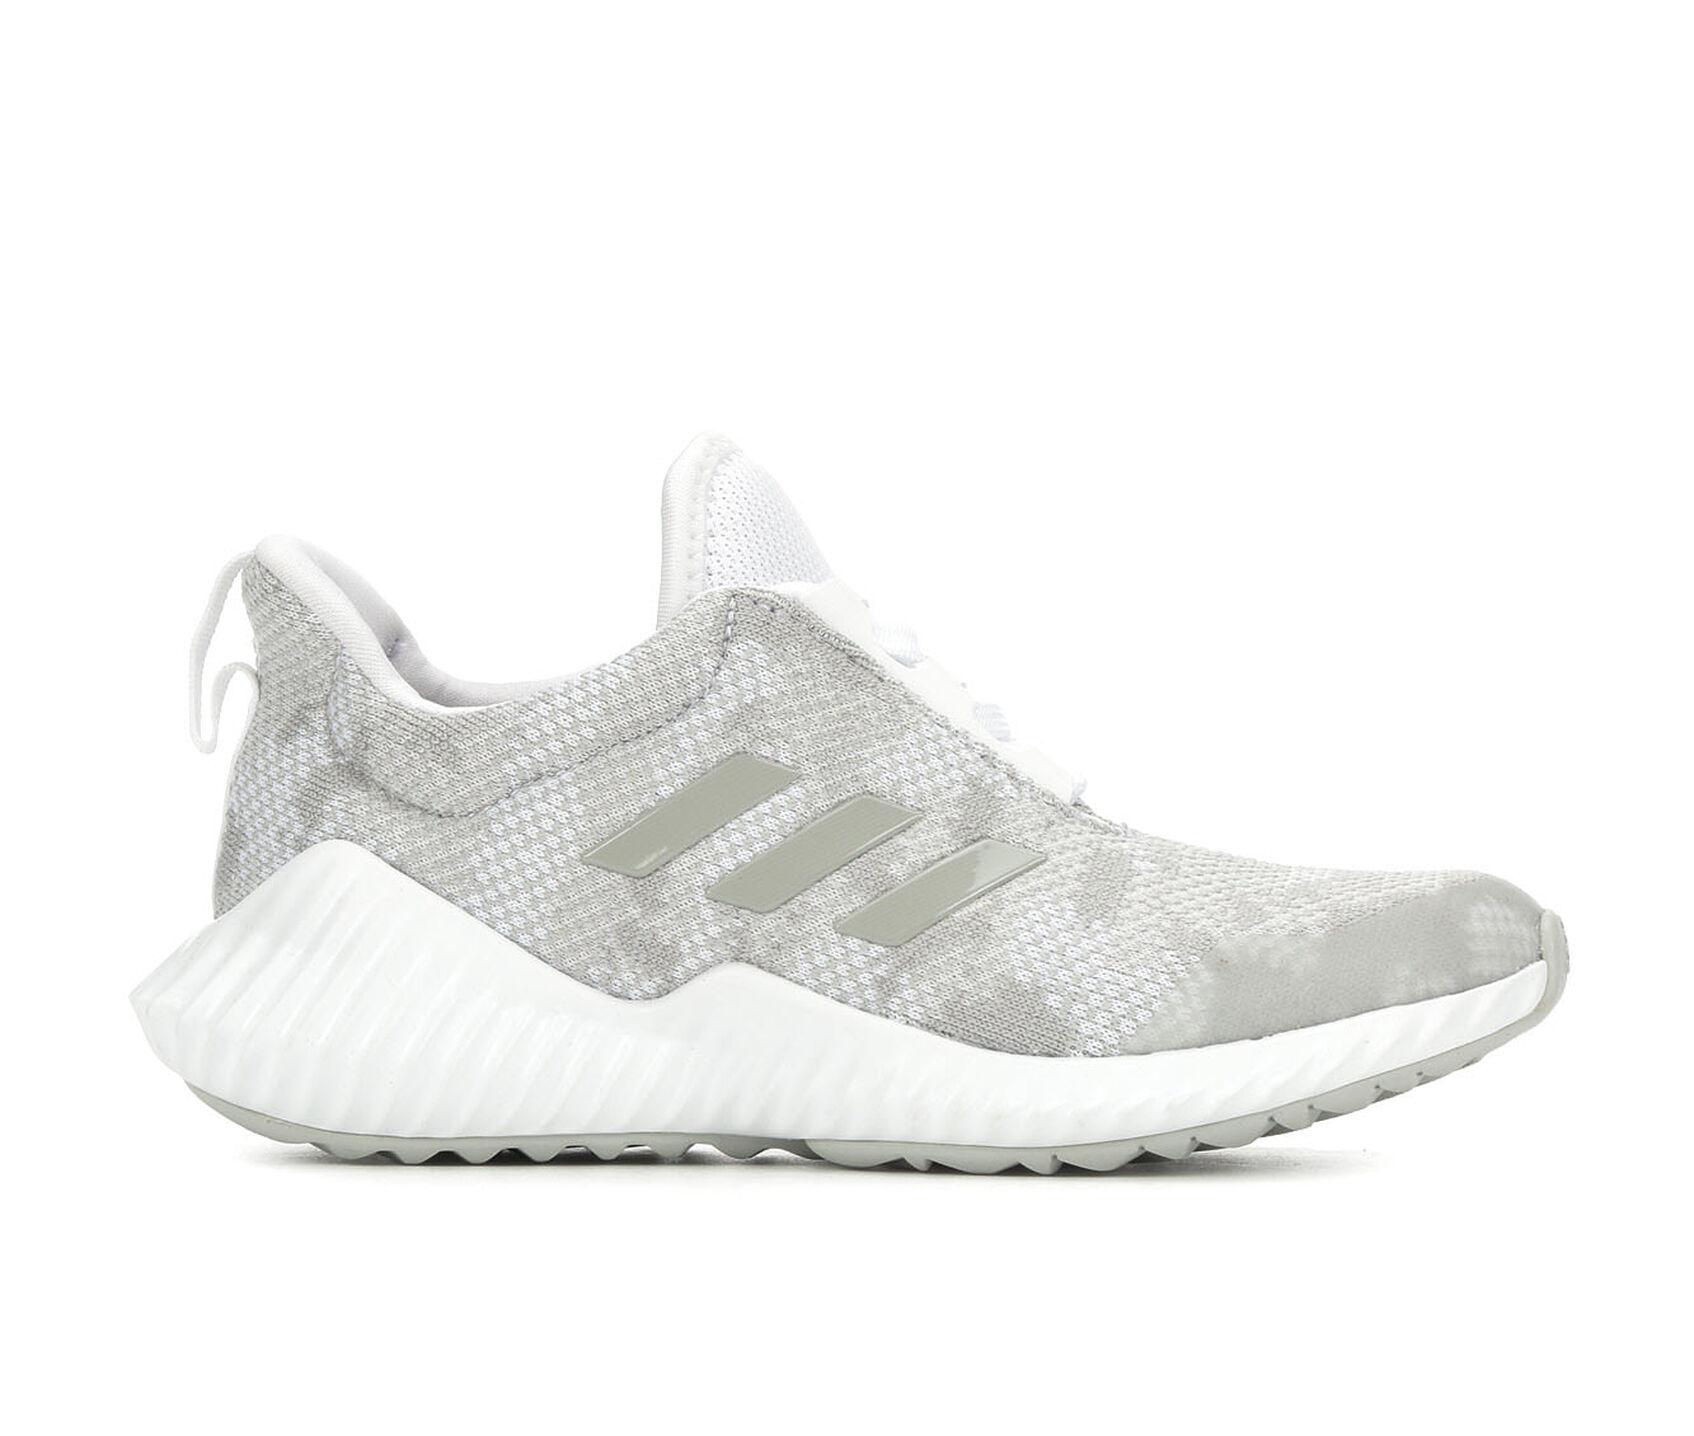 0473c8a4111 Girls  Adidas Little Kid   Big Kid Fortarun G Running Shoes